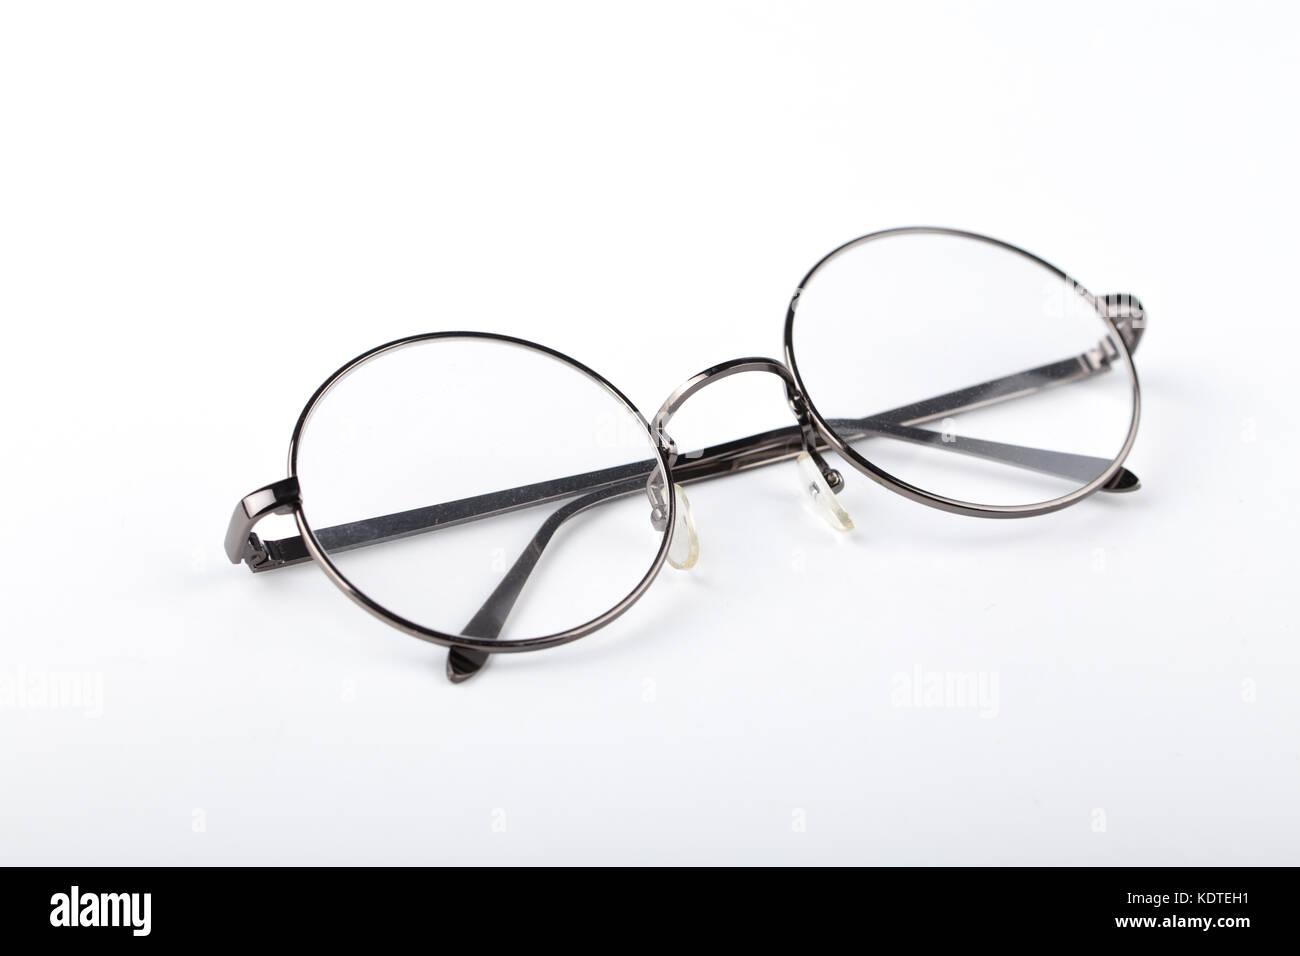 d79cf4d4c537f Circle glasses Stock Photo  163422141 - Alamy